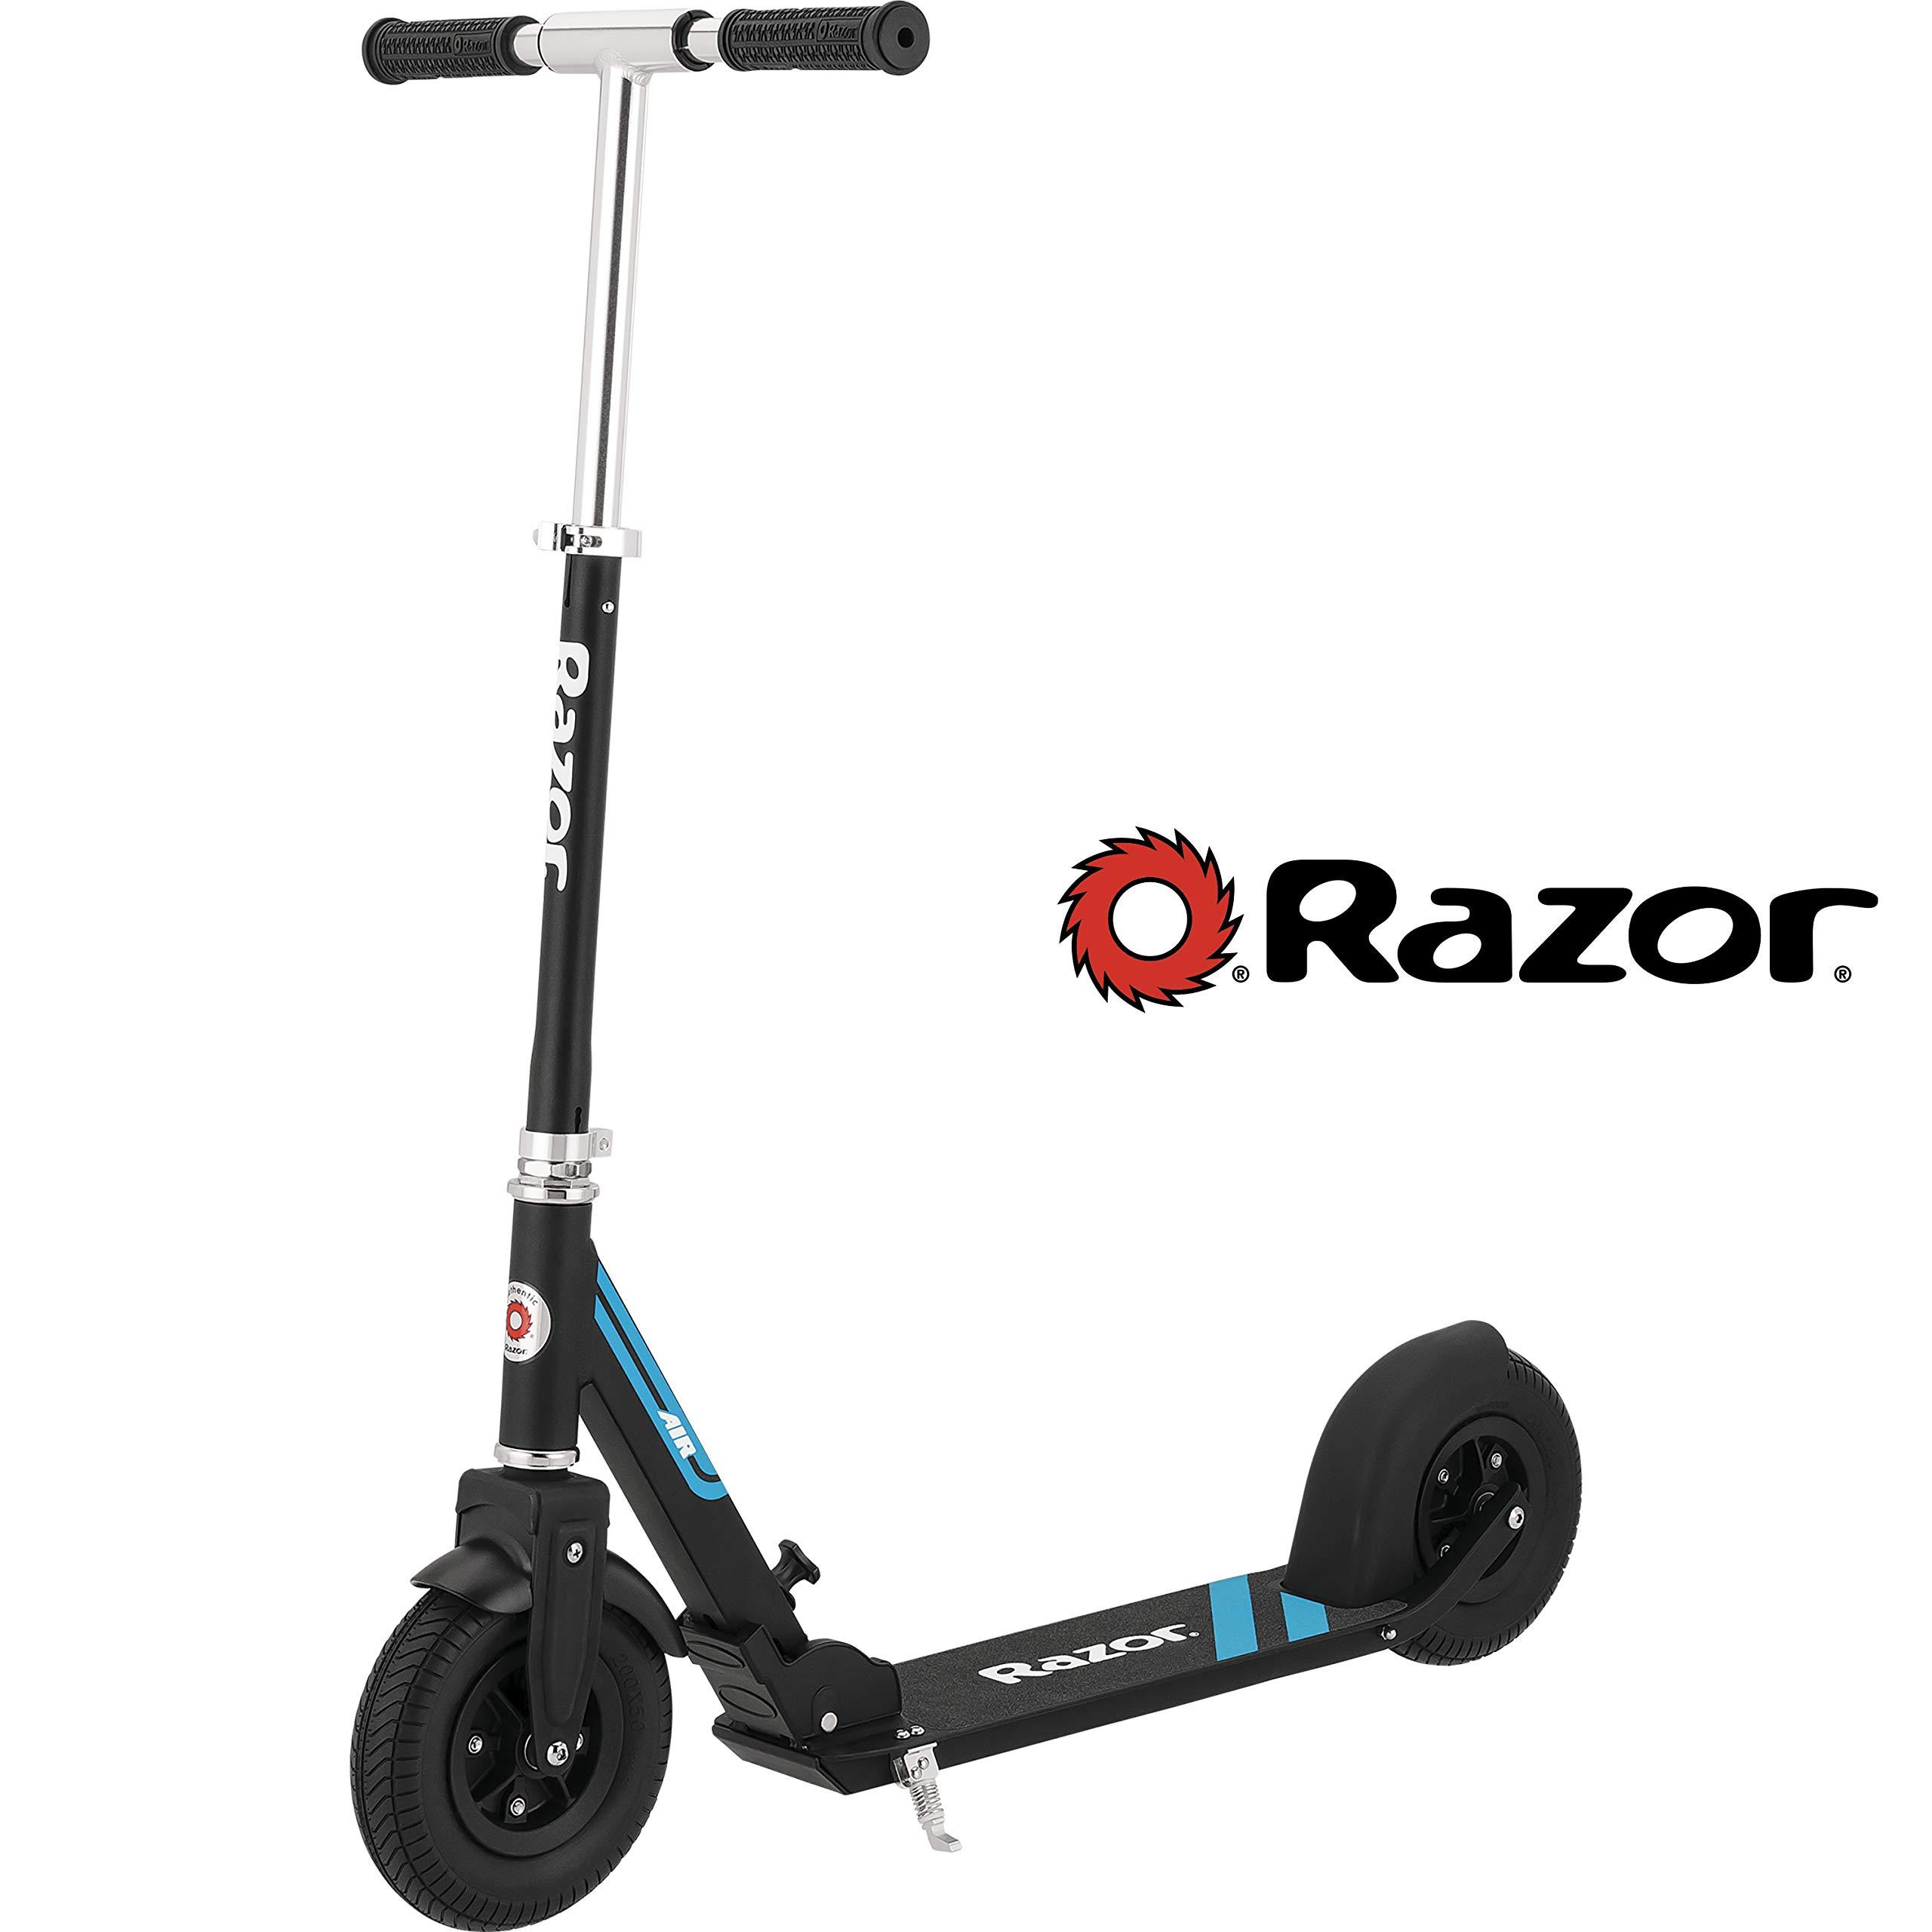 Razor A5 Air Kick Scooter - Black by Razor